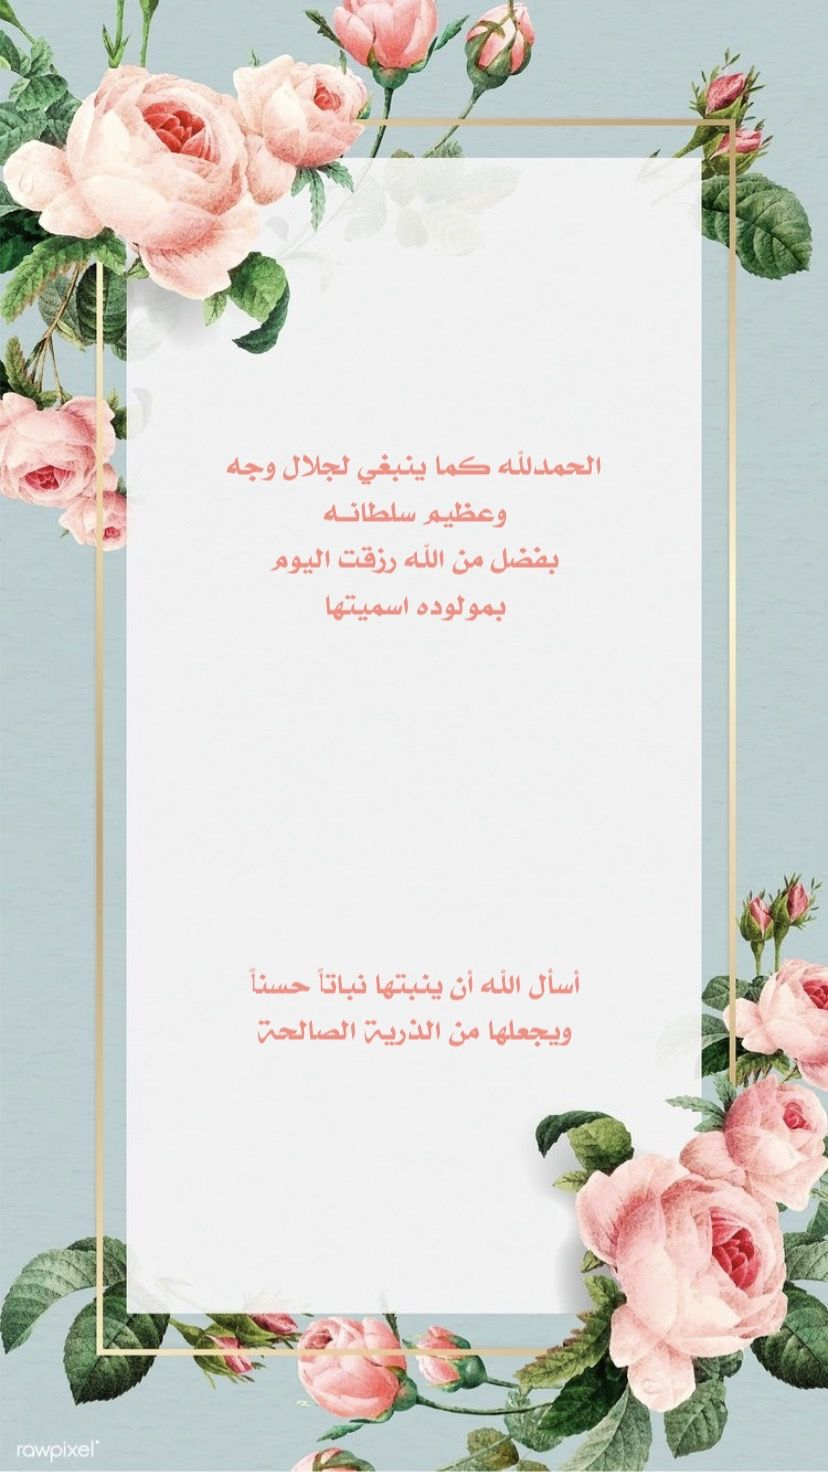 Pin By Noura On بشارة مولود Flower Phone Wallpaper Floral Wallpaper Phone Iphone Wallpaper Sky